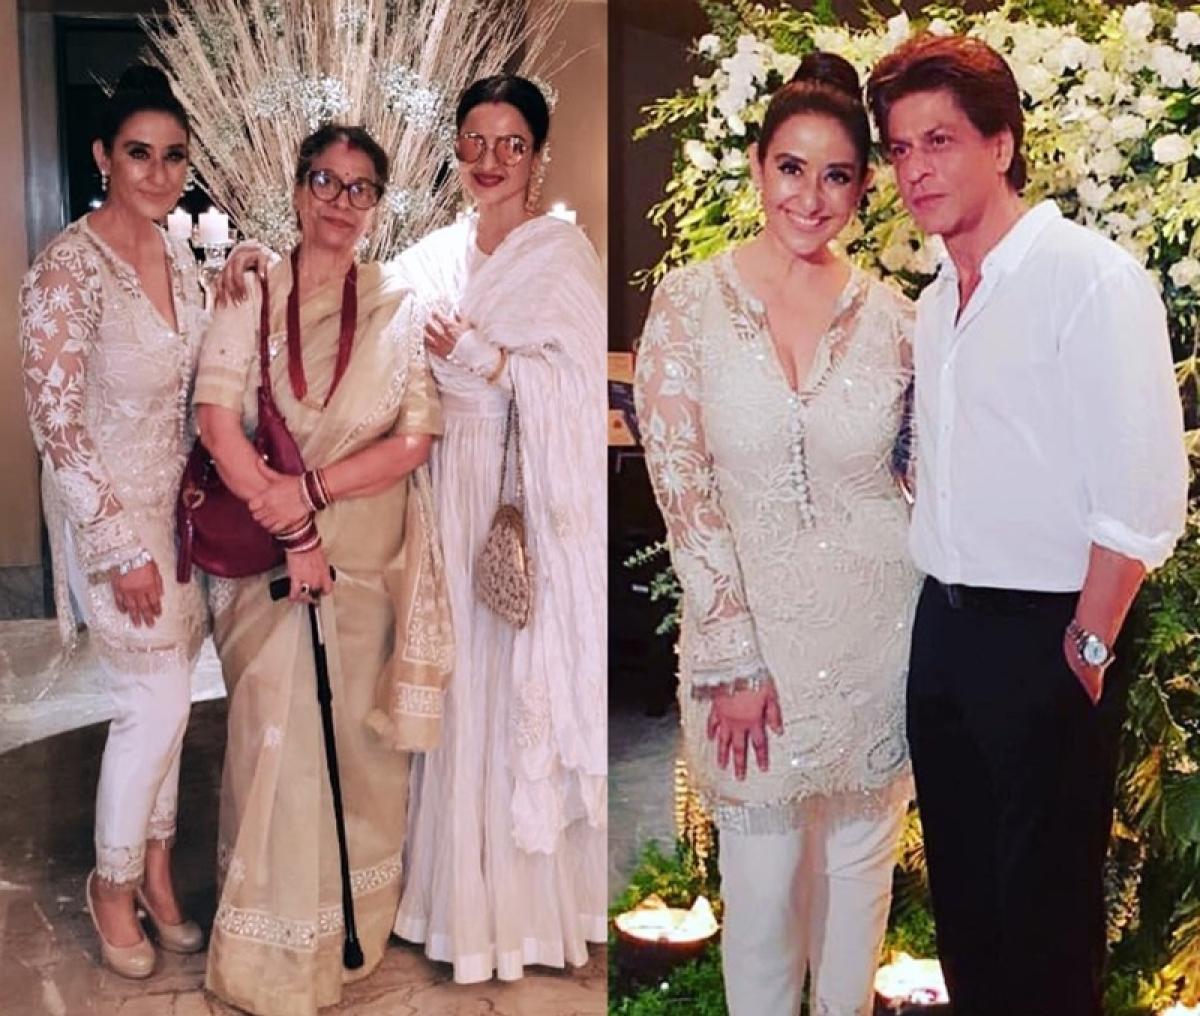 Inside Pics! Manisha Koirala celebrates 48th birthday with Bollywood biggies Rekha, Shah Rukh Khan and more